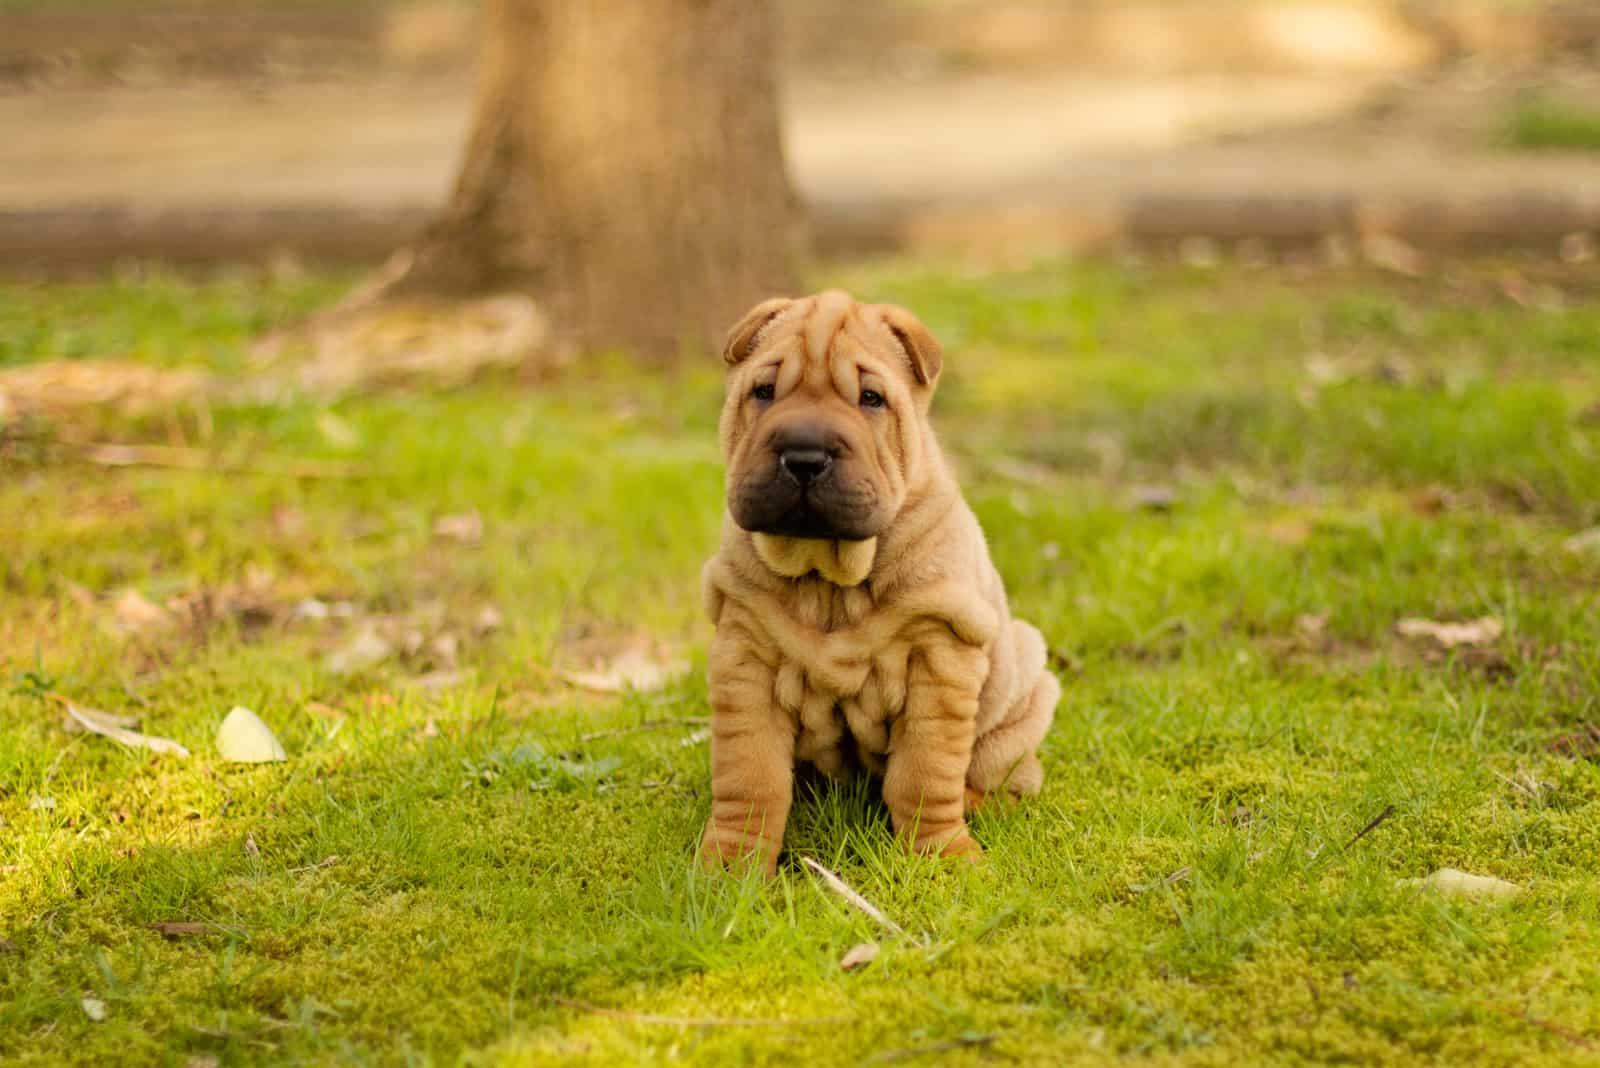 shar pei dog puppy sitting on the grass